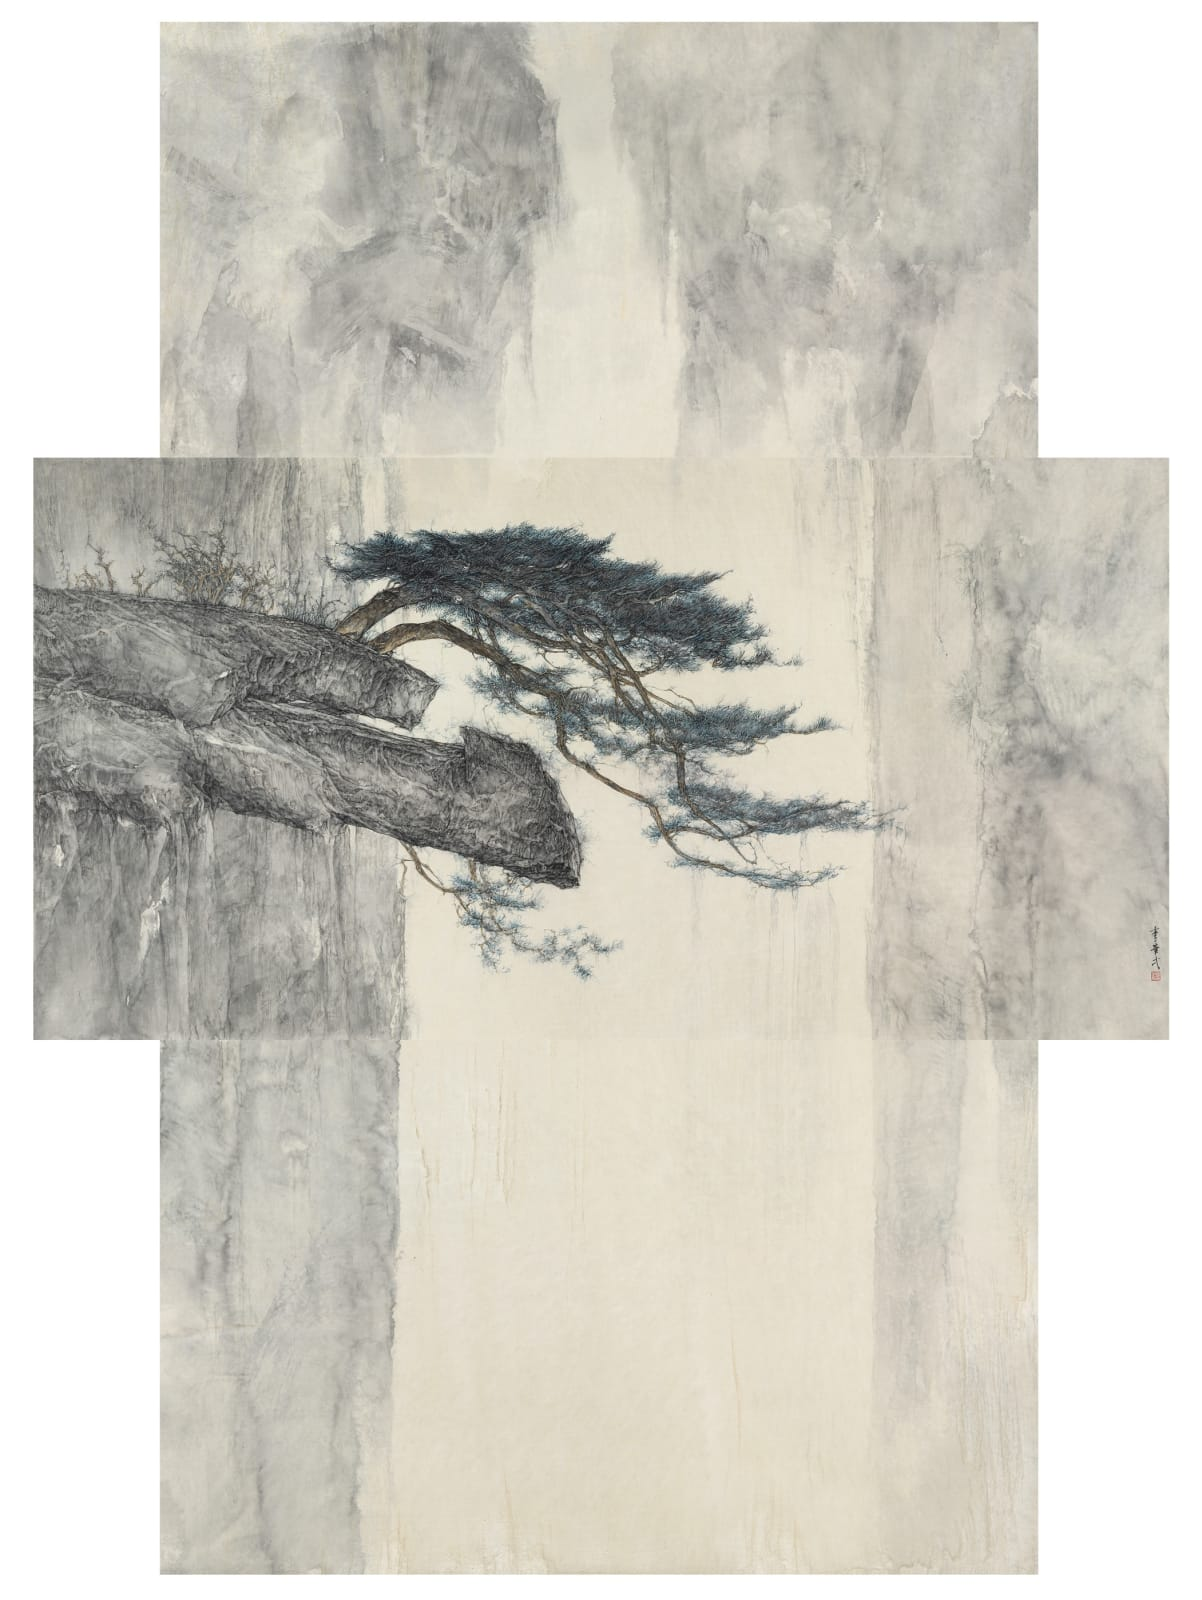 Li Huayi 李華弌, Ripples of Gleam《漾清輝》, 2017